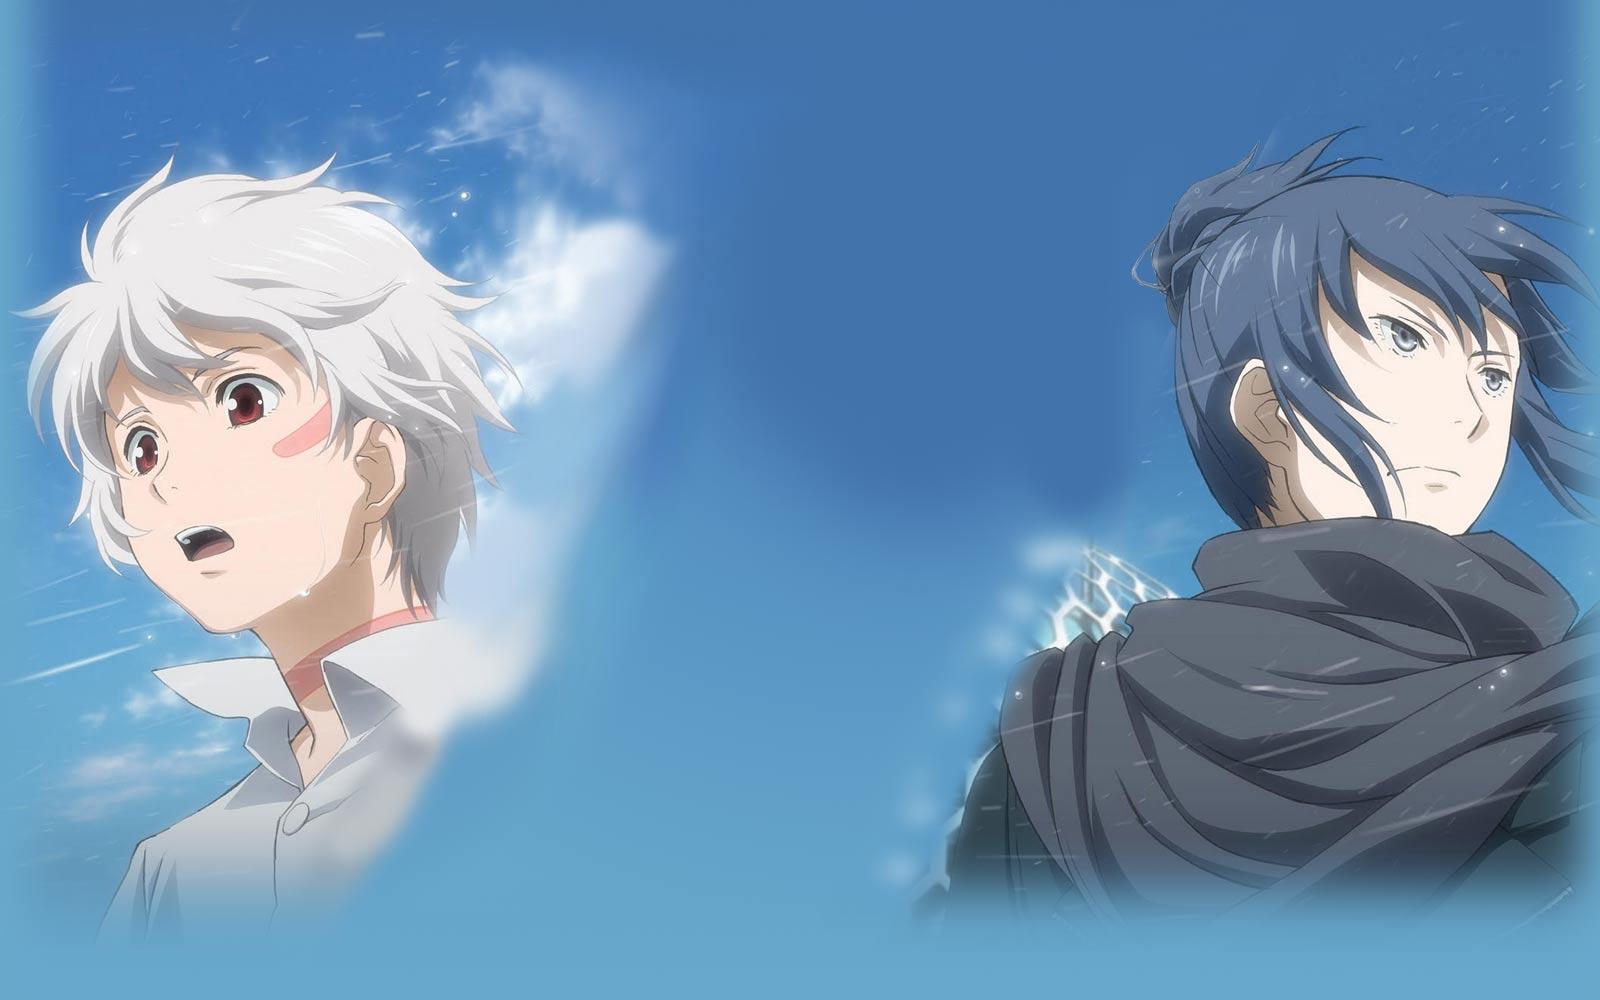 No 6 Anime Characters : ⭐ an unpopular anime no ⭐ anime amino